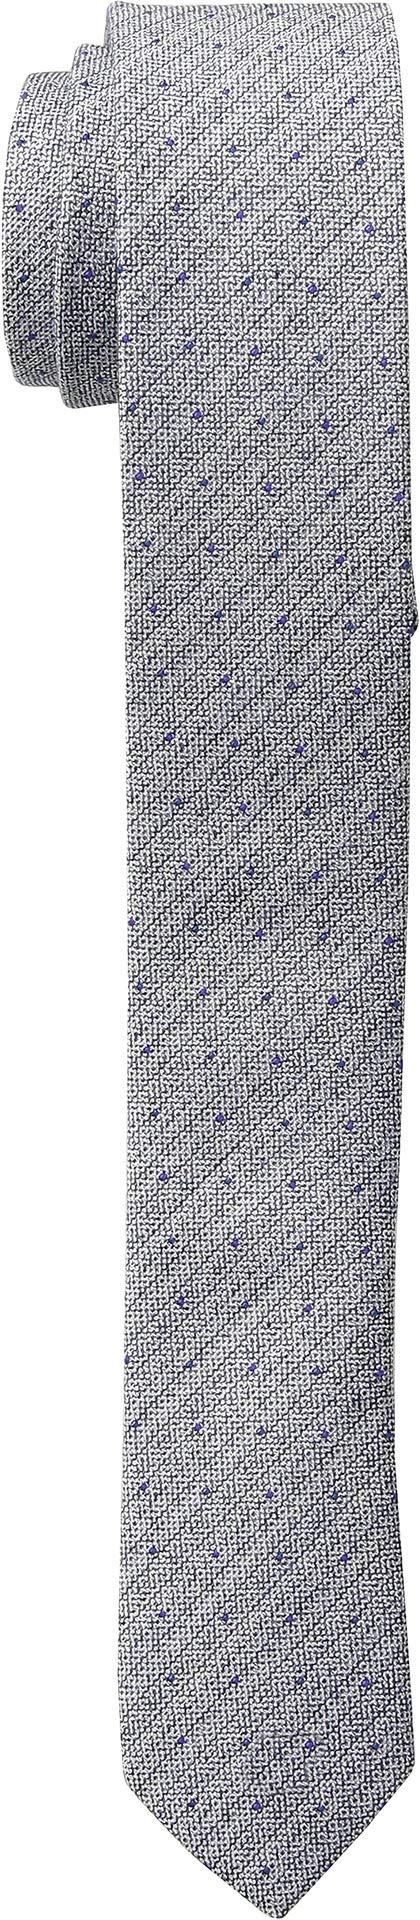 Appaman Kids Boy's Tie (Little Kids/Big Kids) Novelty Micro Dots SM/MD